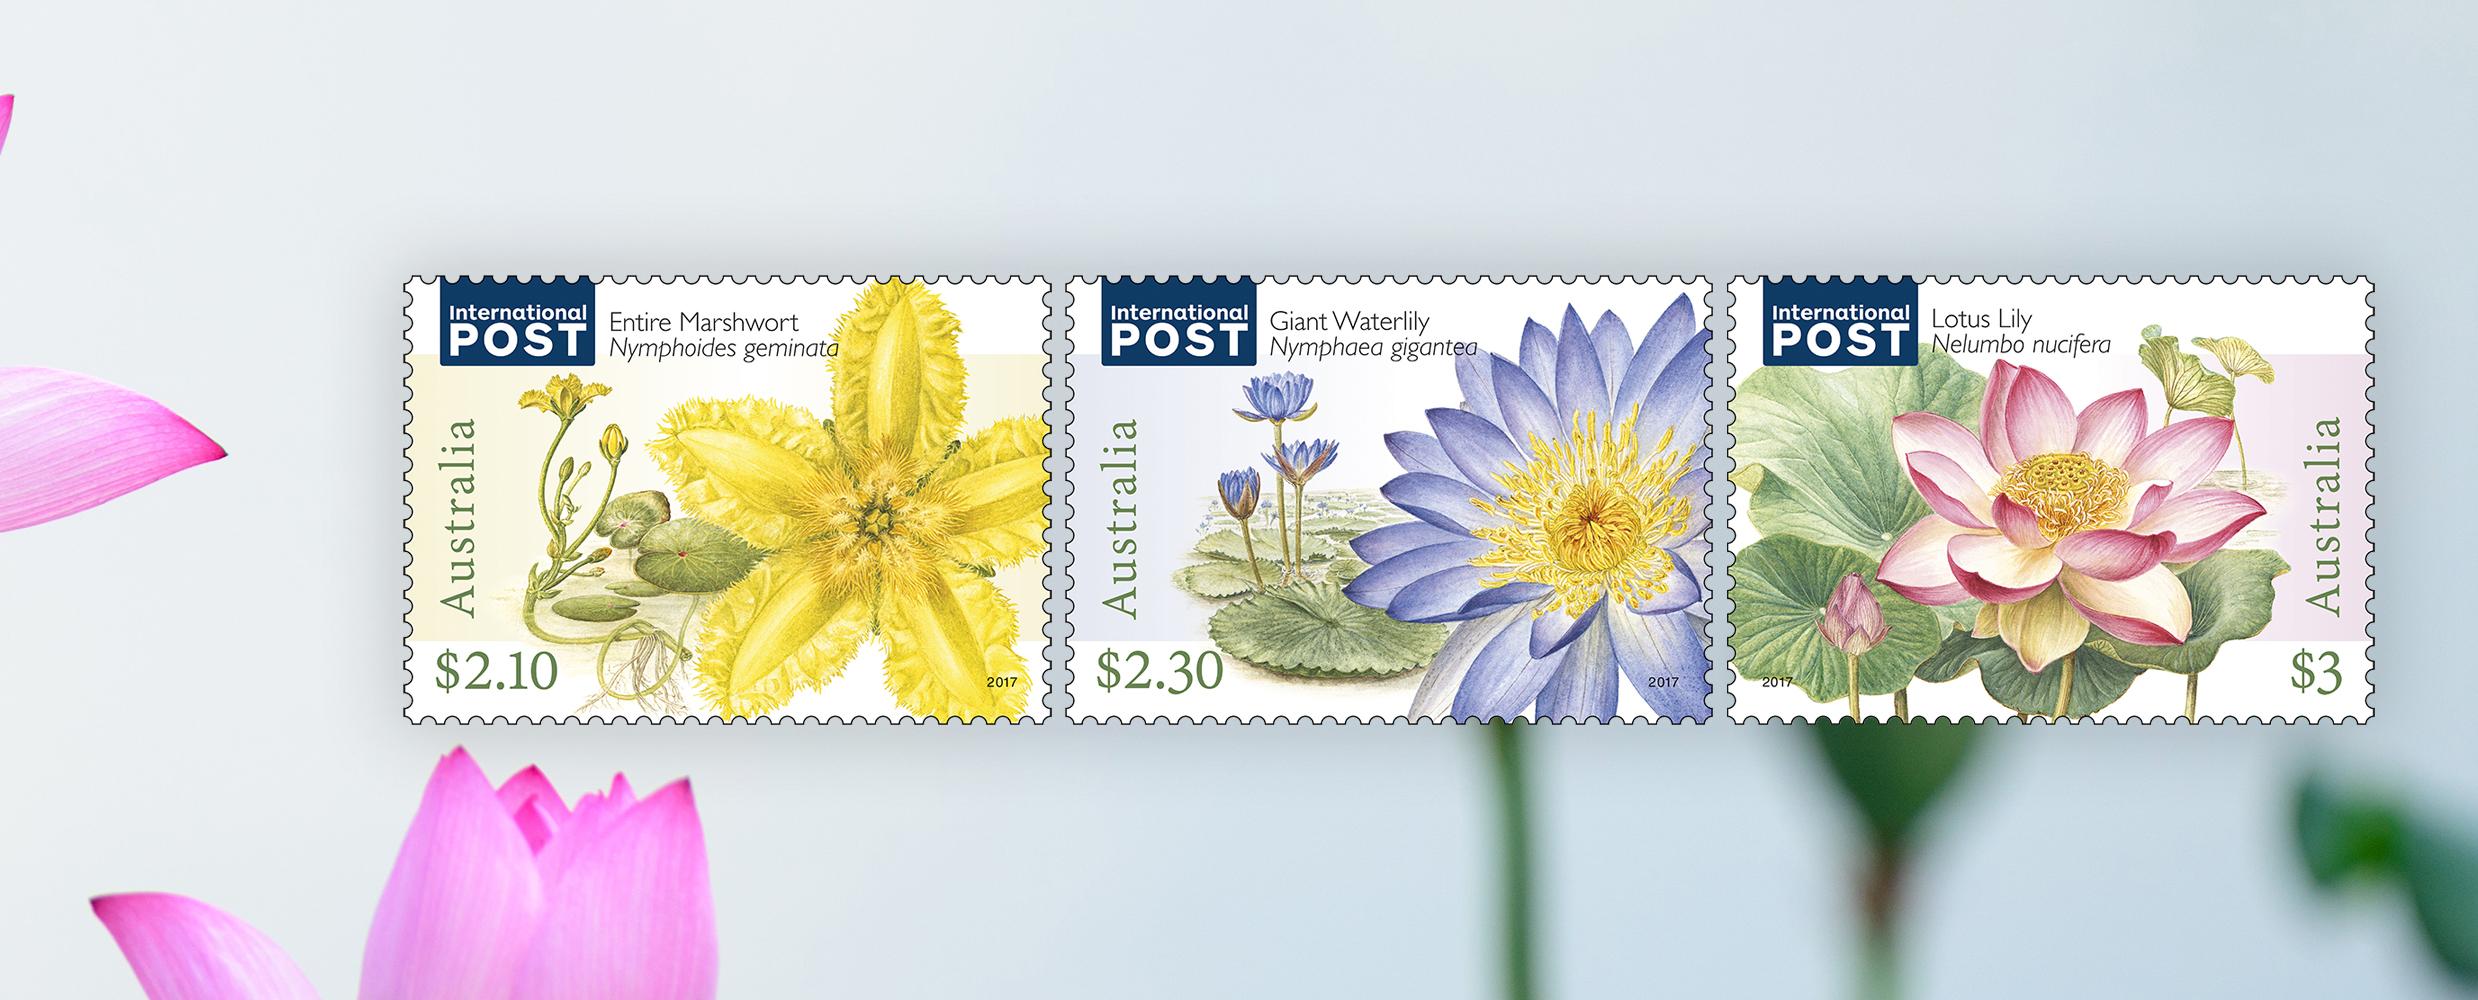 Jenny Phillips On The Art Of Botanical Illustration Australia Post